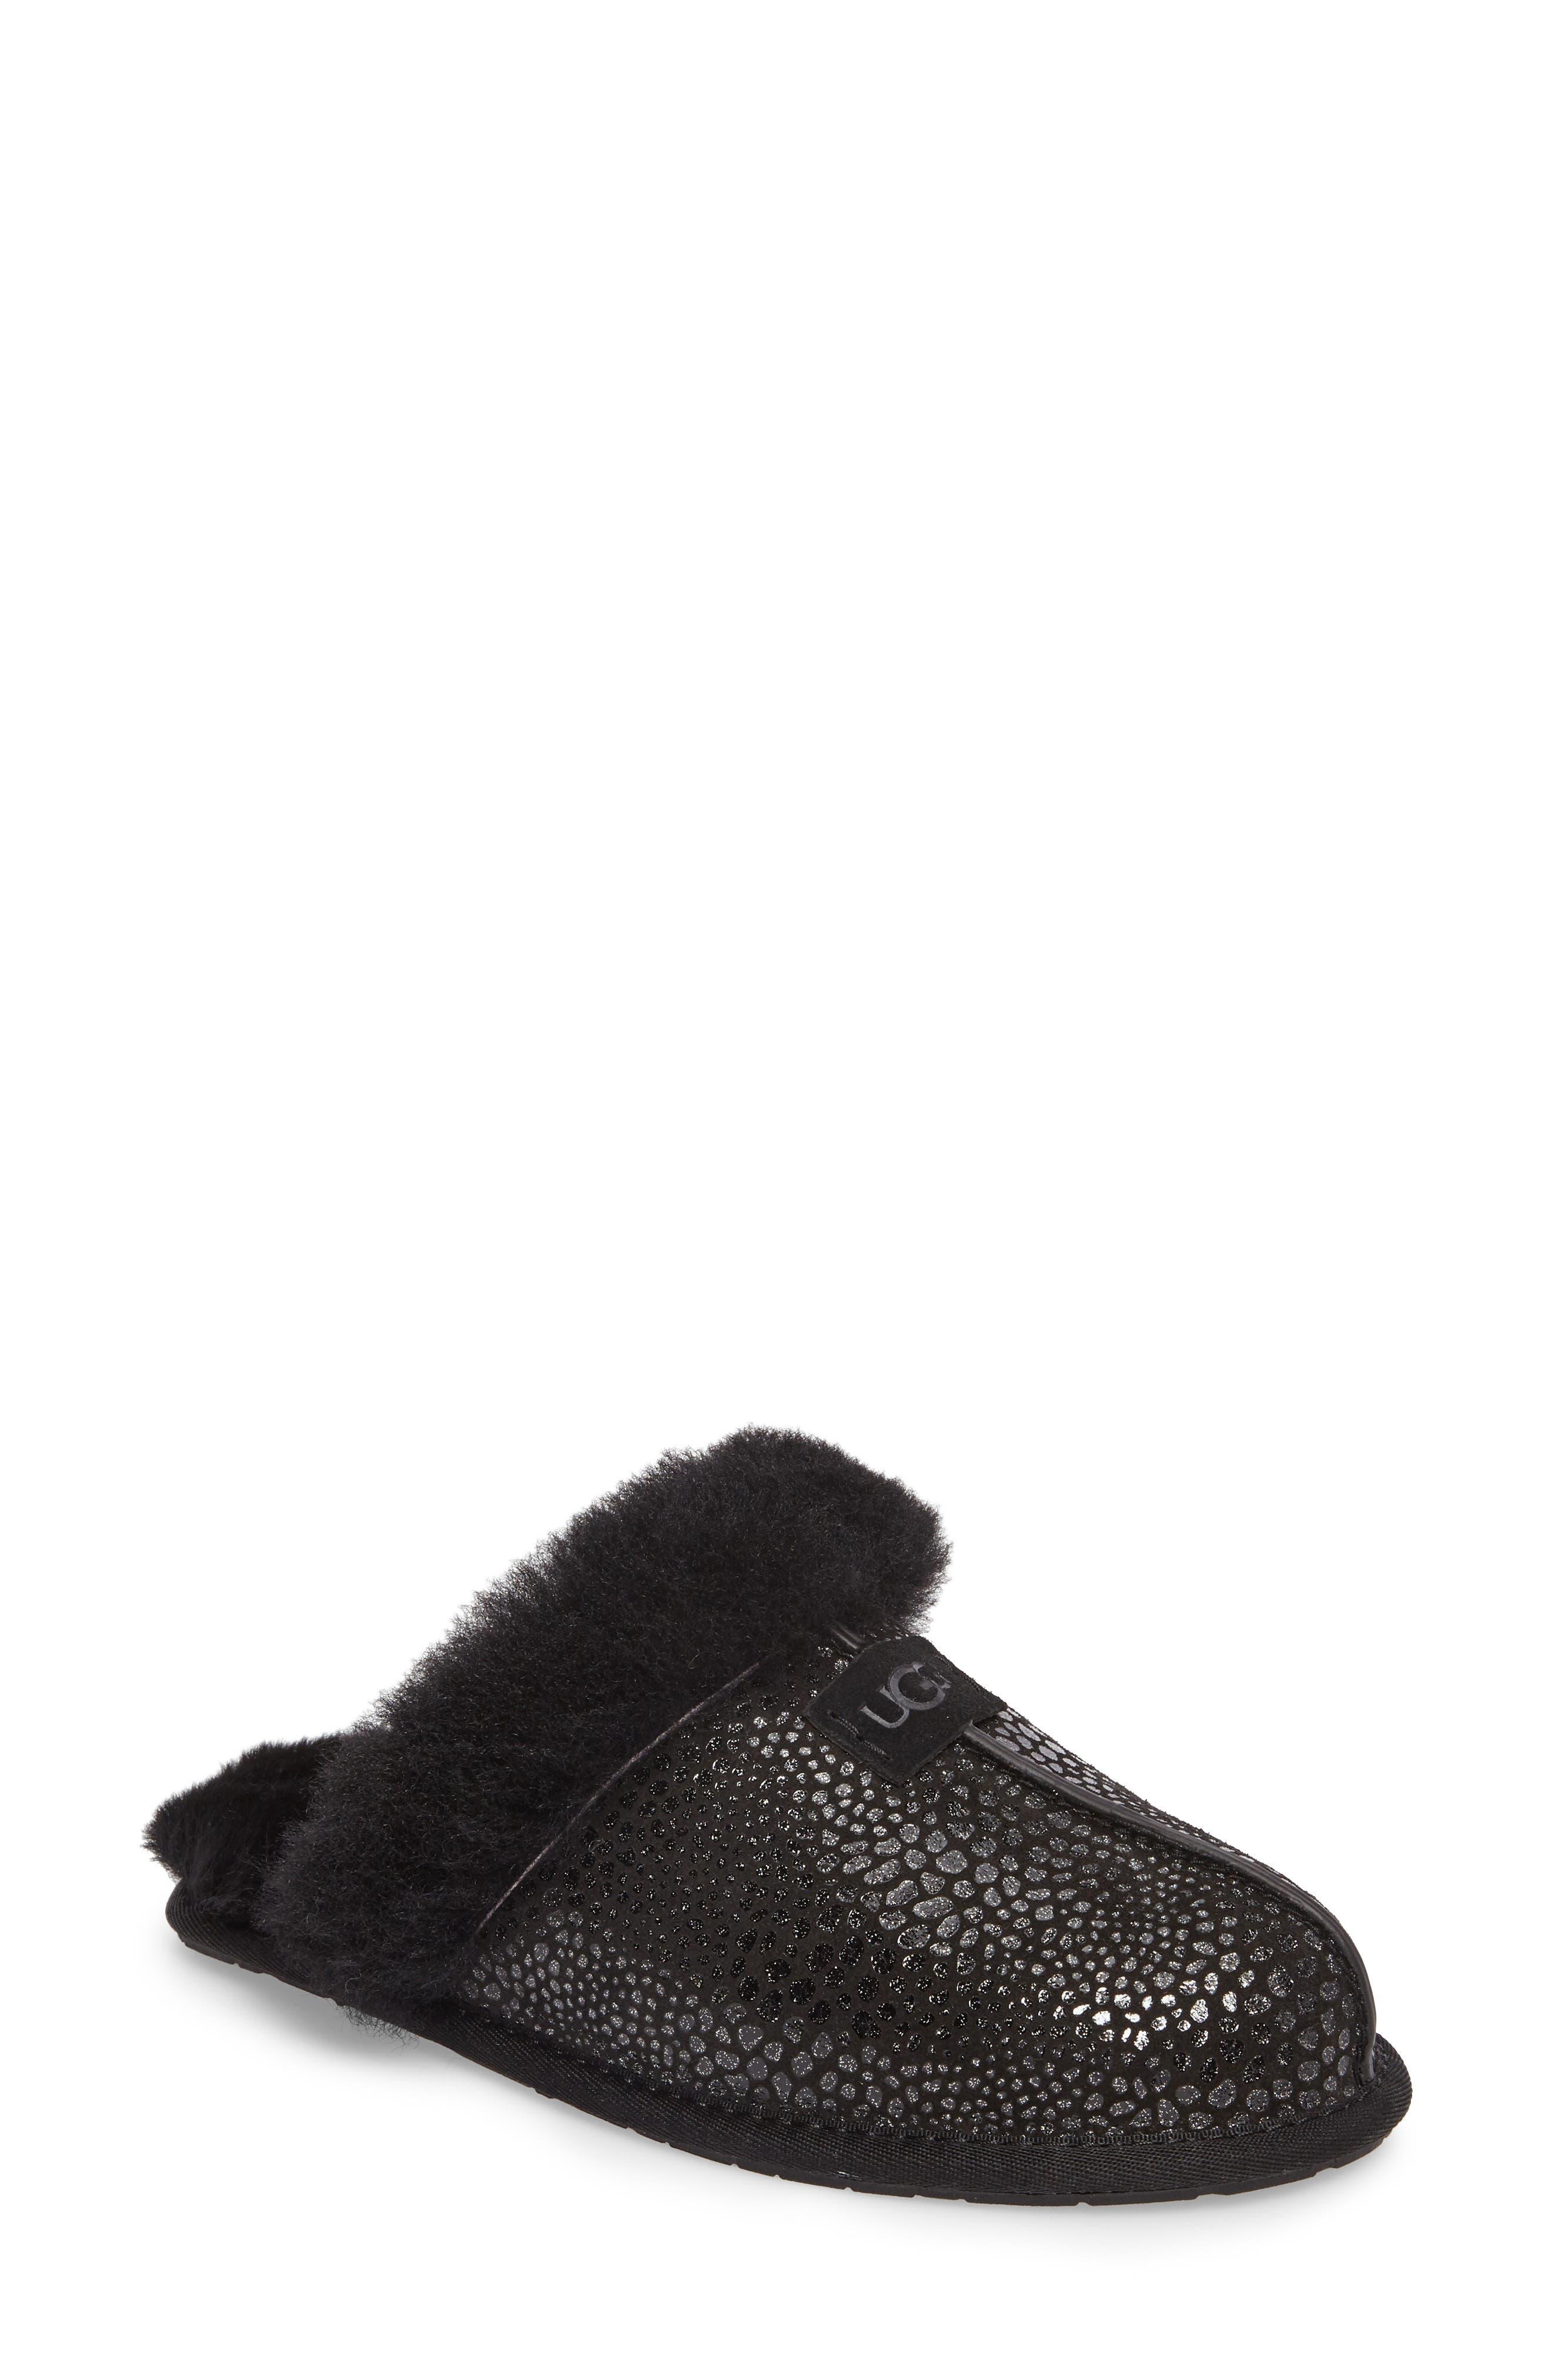 Main Image - UGG® Scuffette II Glitzy Slipper (Women)